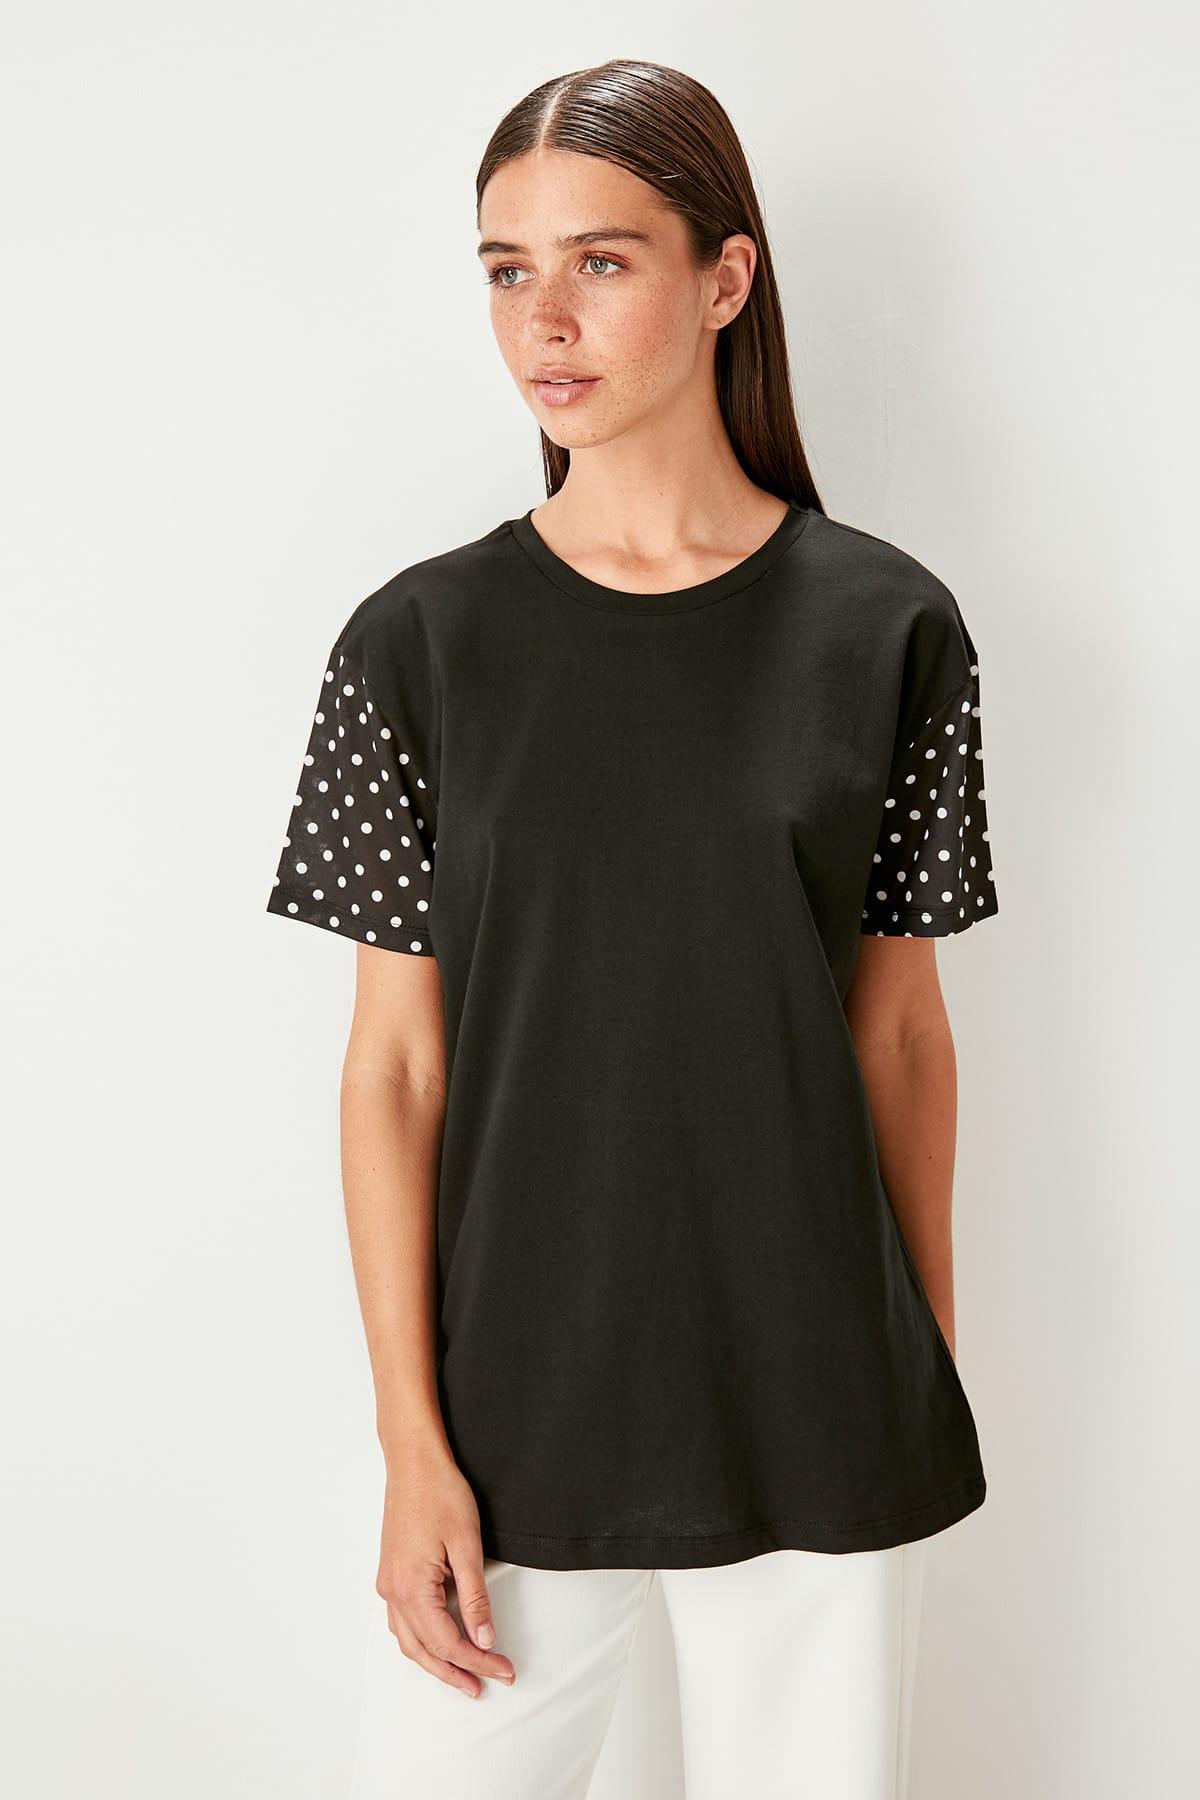 Trendyol Black polka dots Detailed Knitting t-shirt